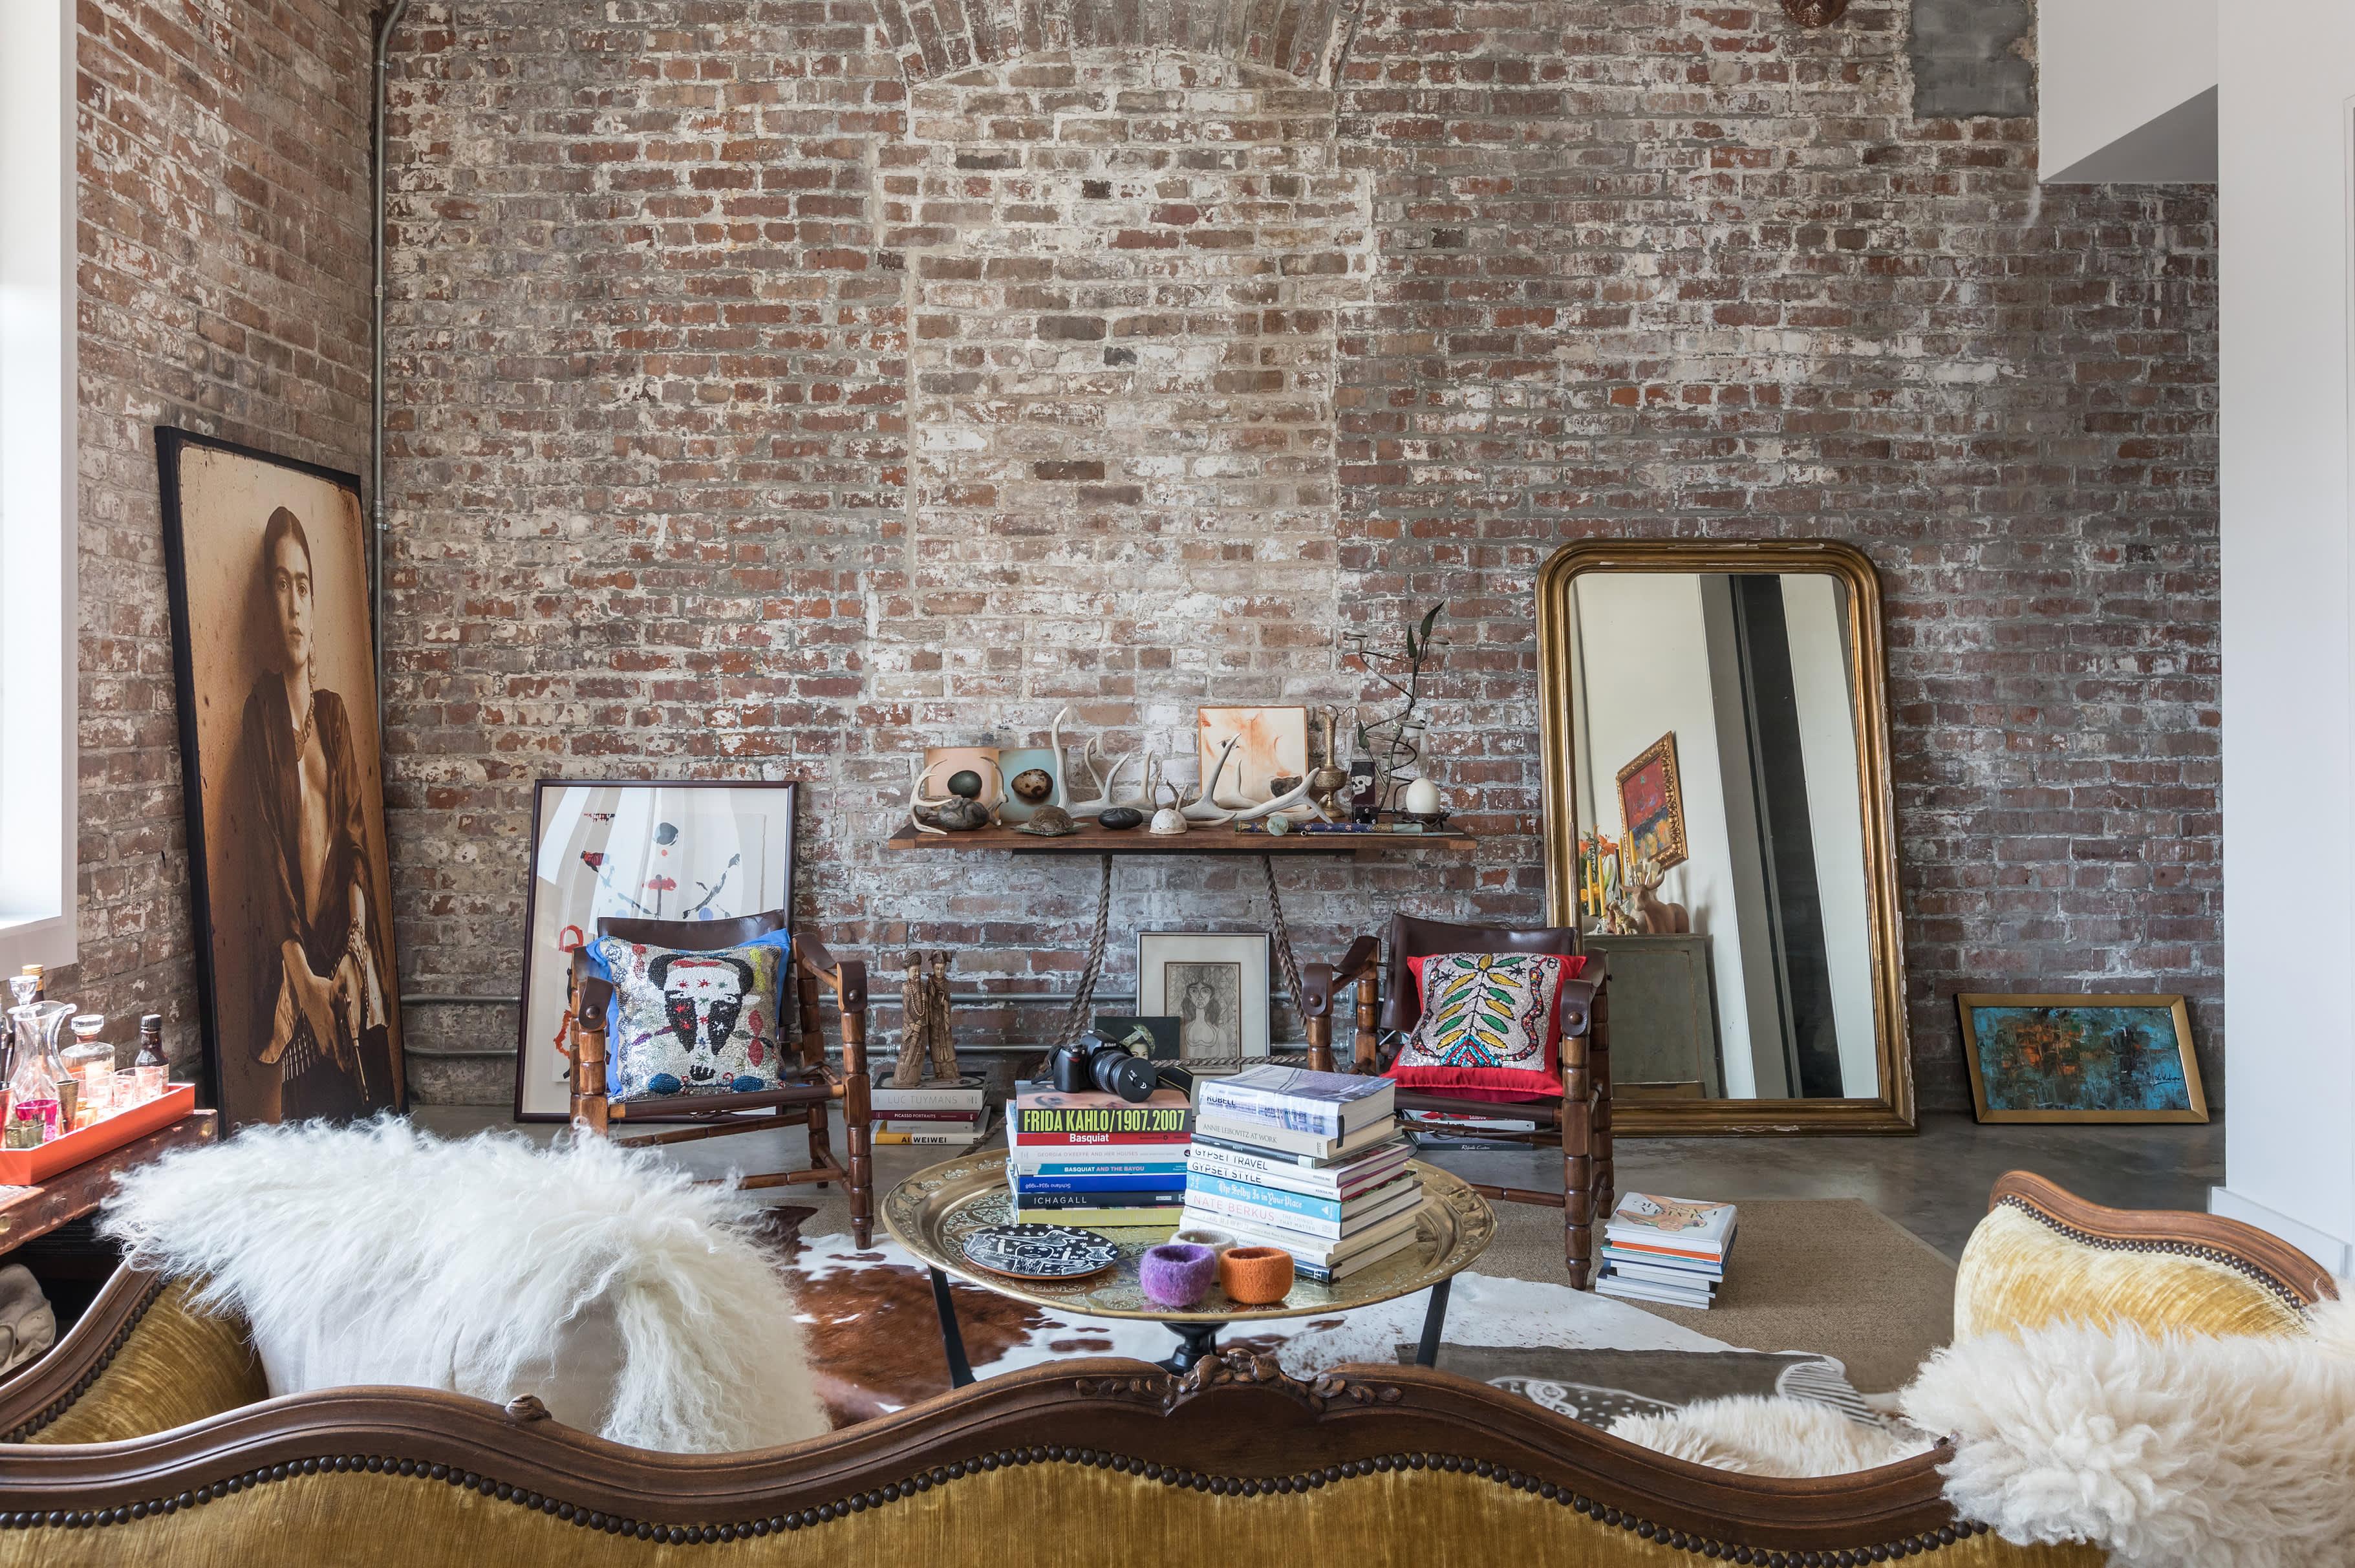 New Orleans Home Tour: A Downtown Art-Filled Loft ...